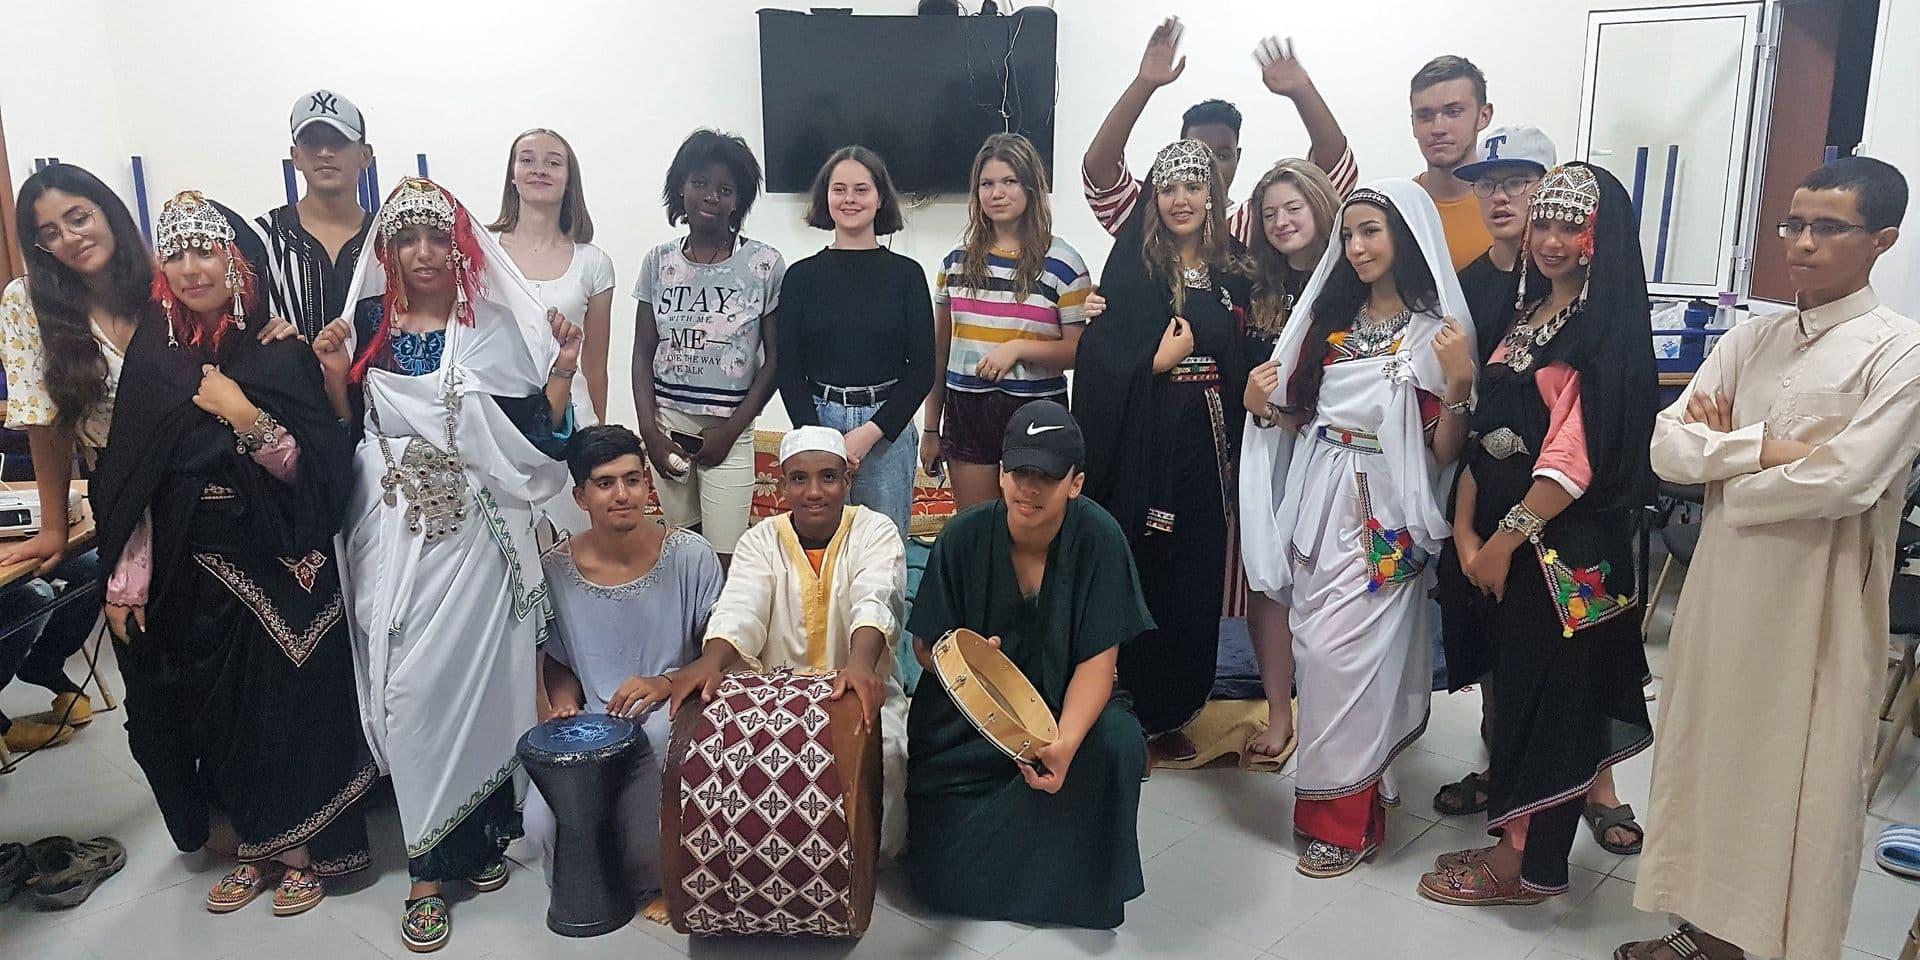 Comines : Une expérience interculturelle au Maroc